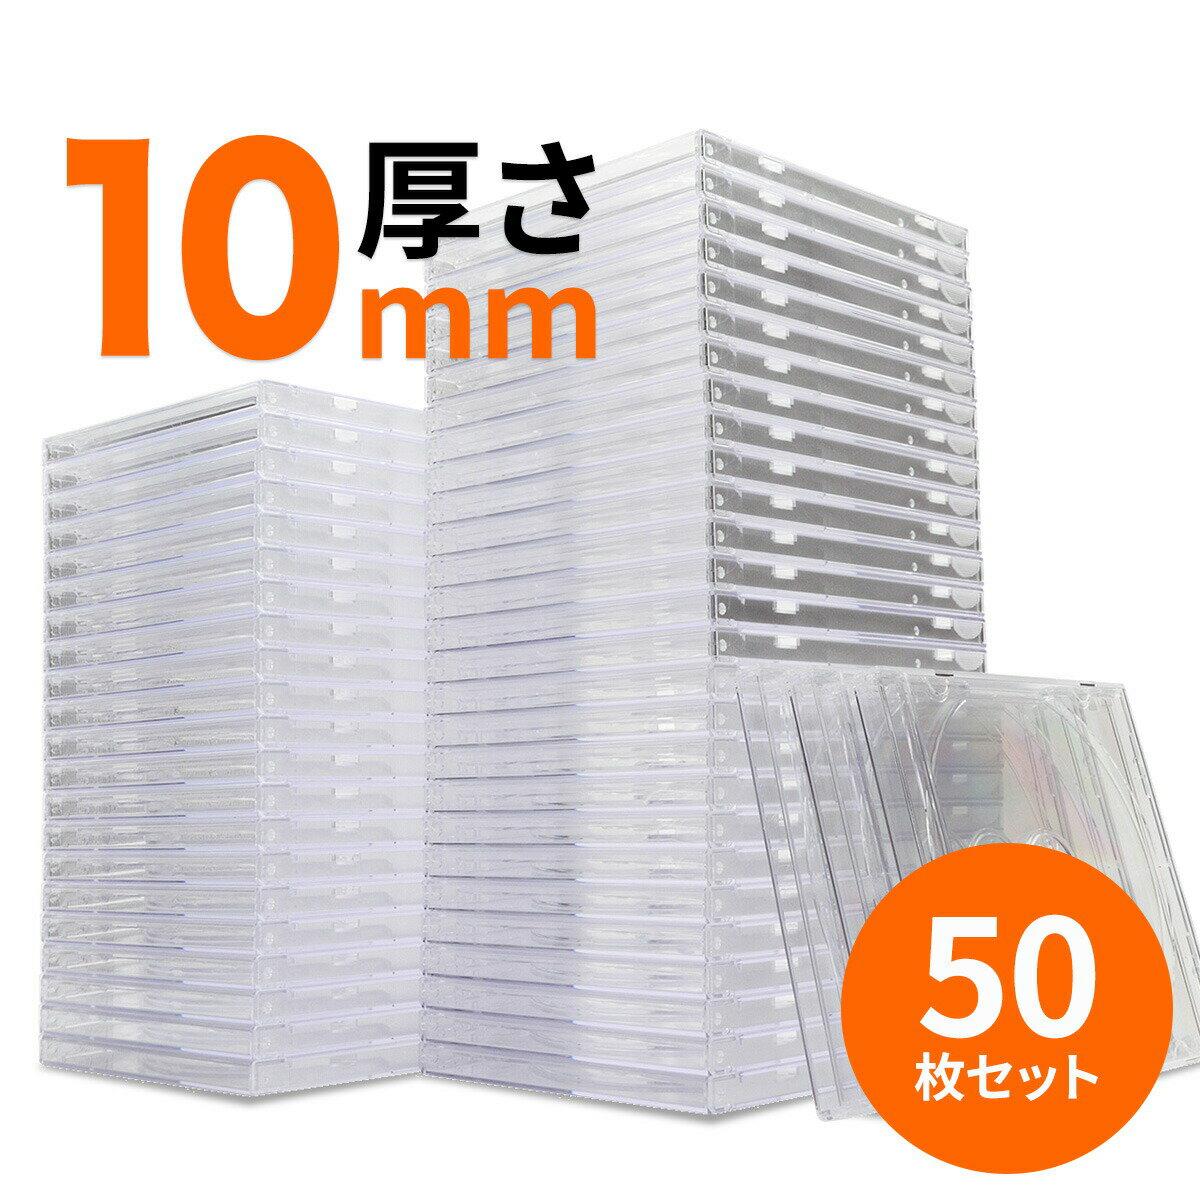 CDケース DVDケース プラケース ジュエルケース 50枚セット 収納ケース メディアケース 10mm [200-FCD024]【サンワダイレクト限定品】